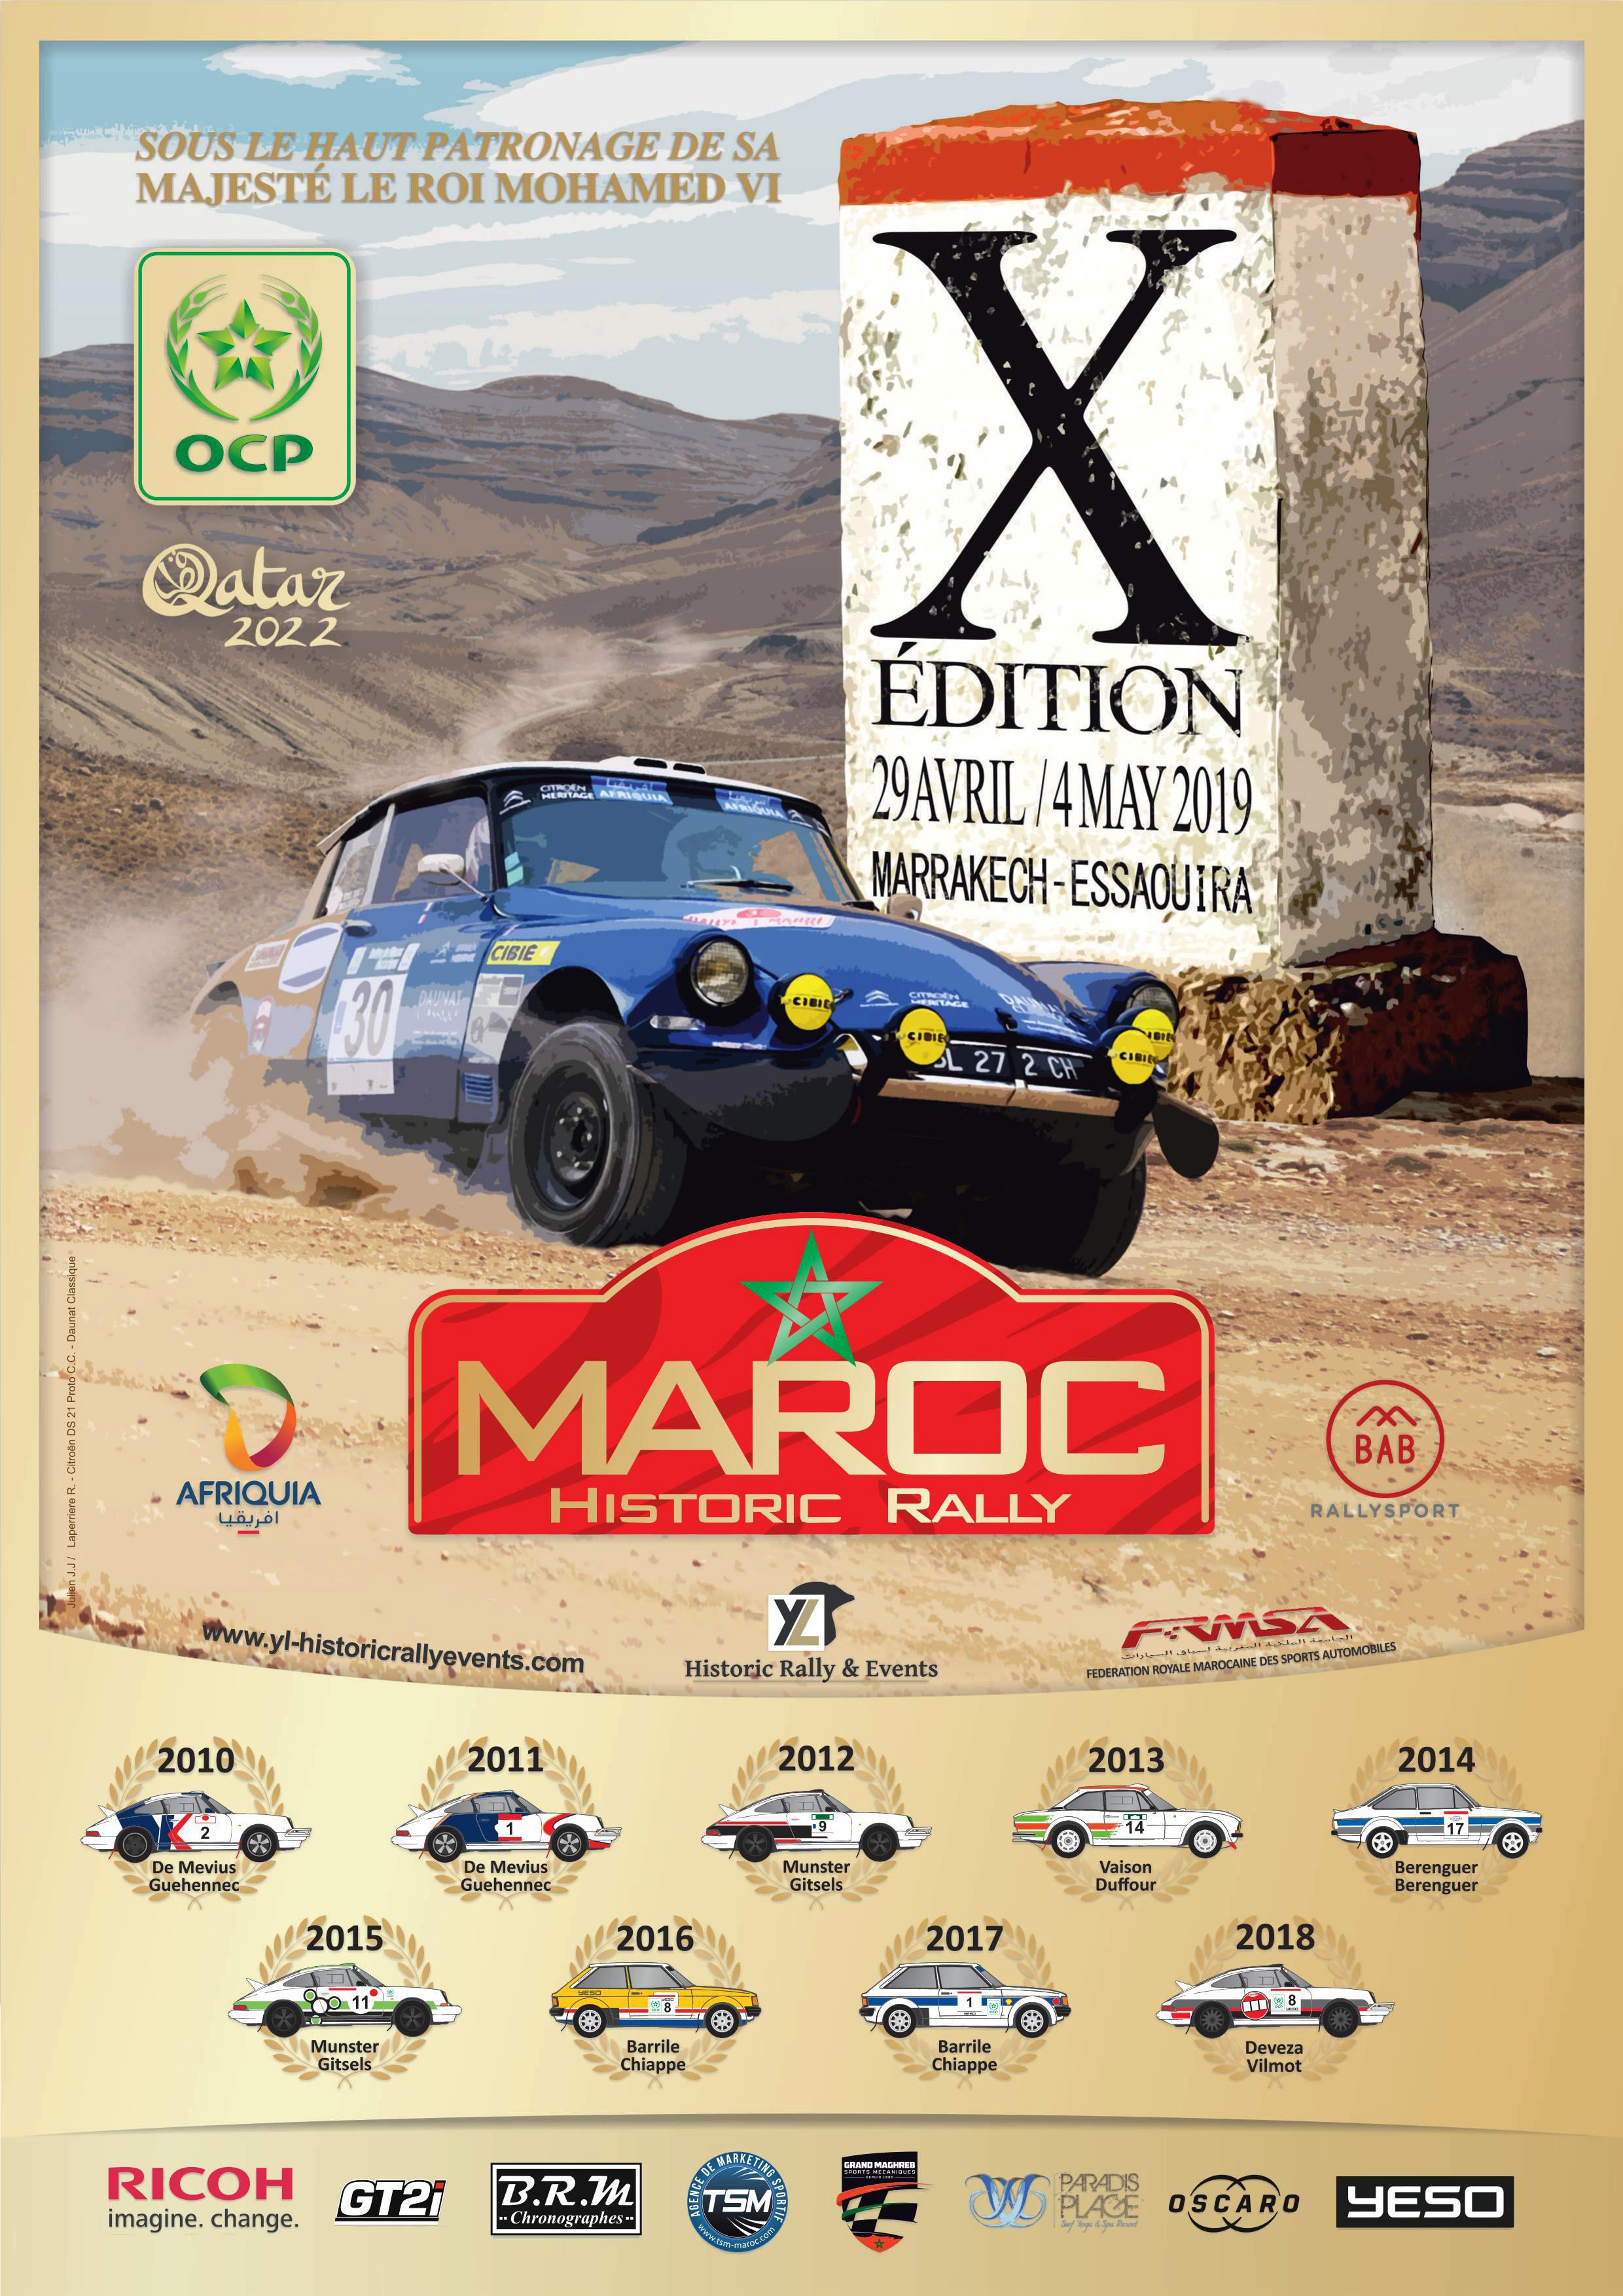 Maroc Historic Rally